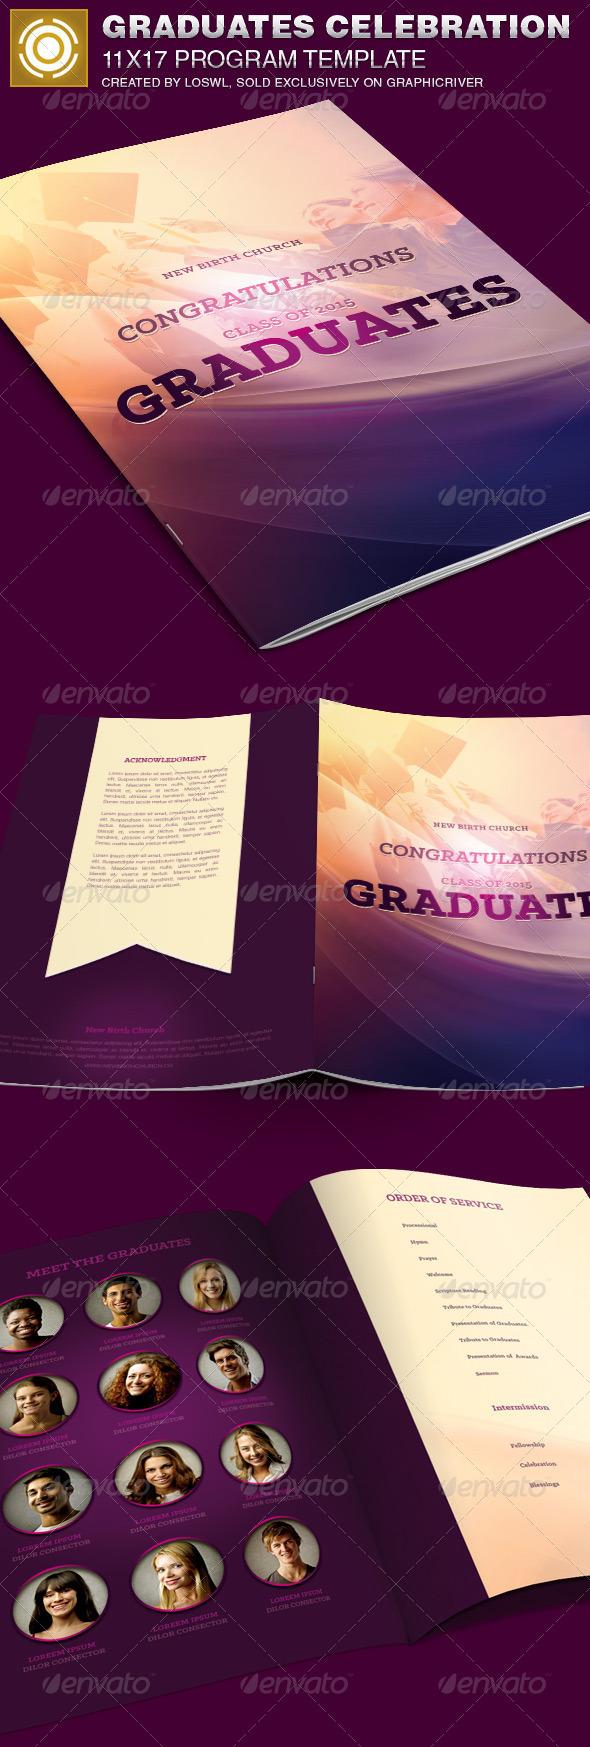 graduates celebration church program template on behance